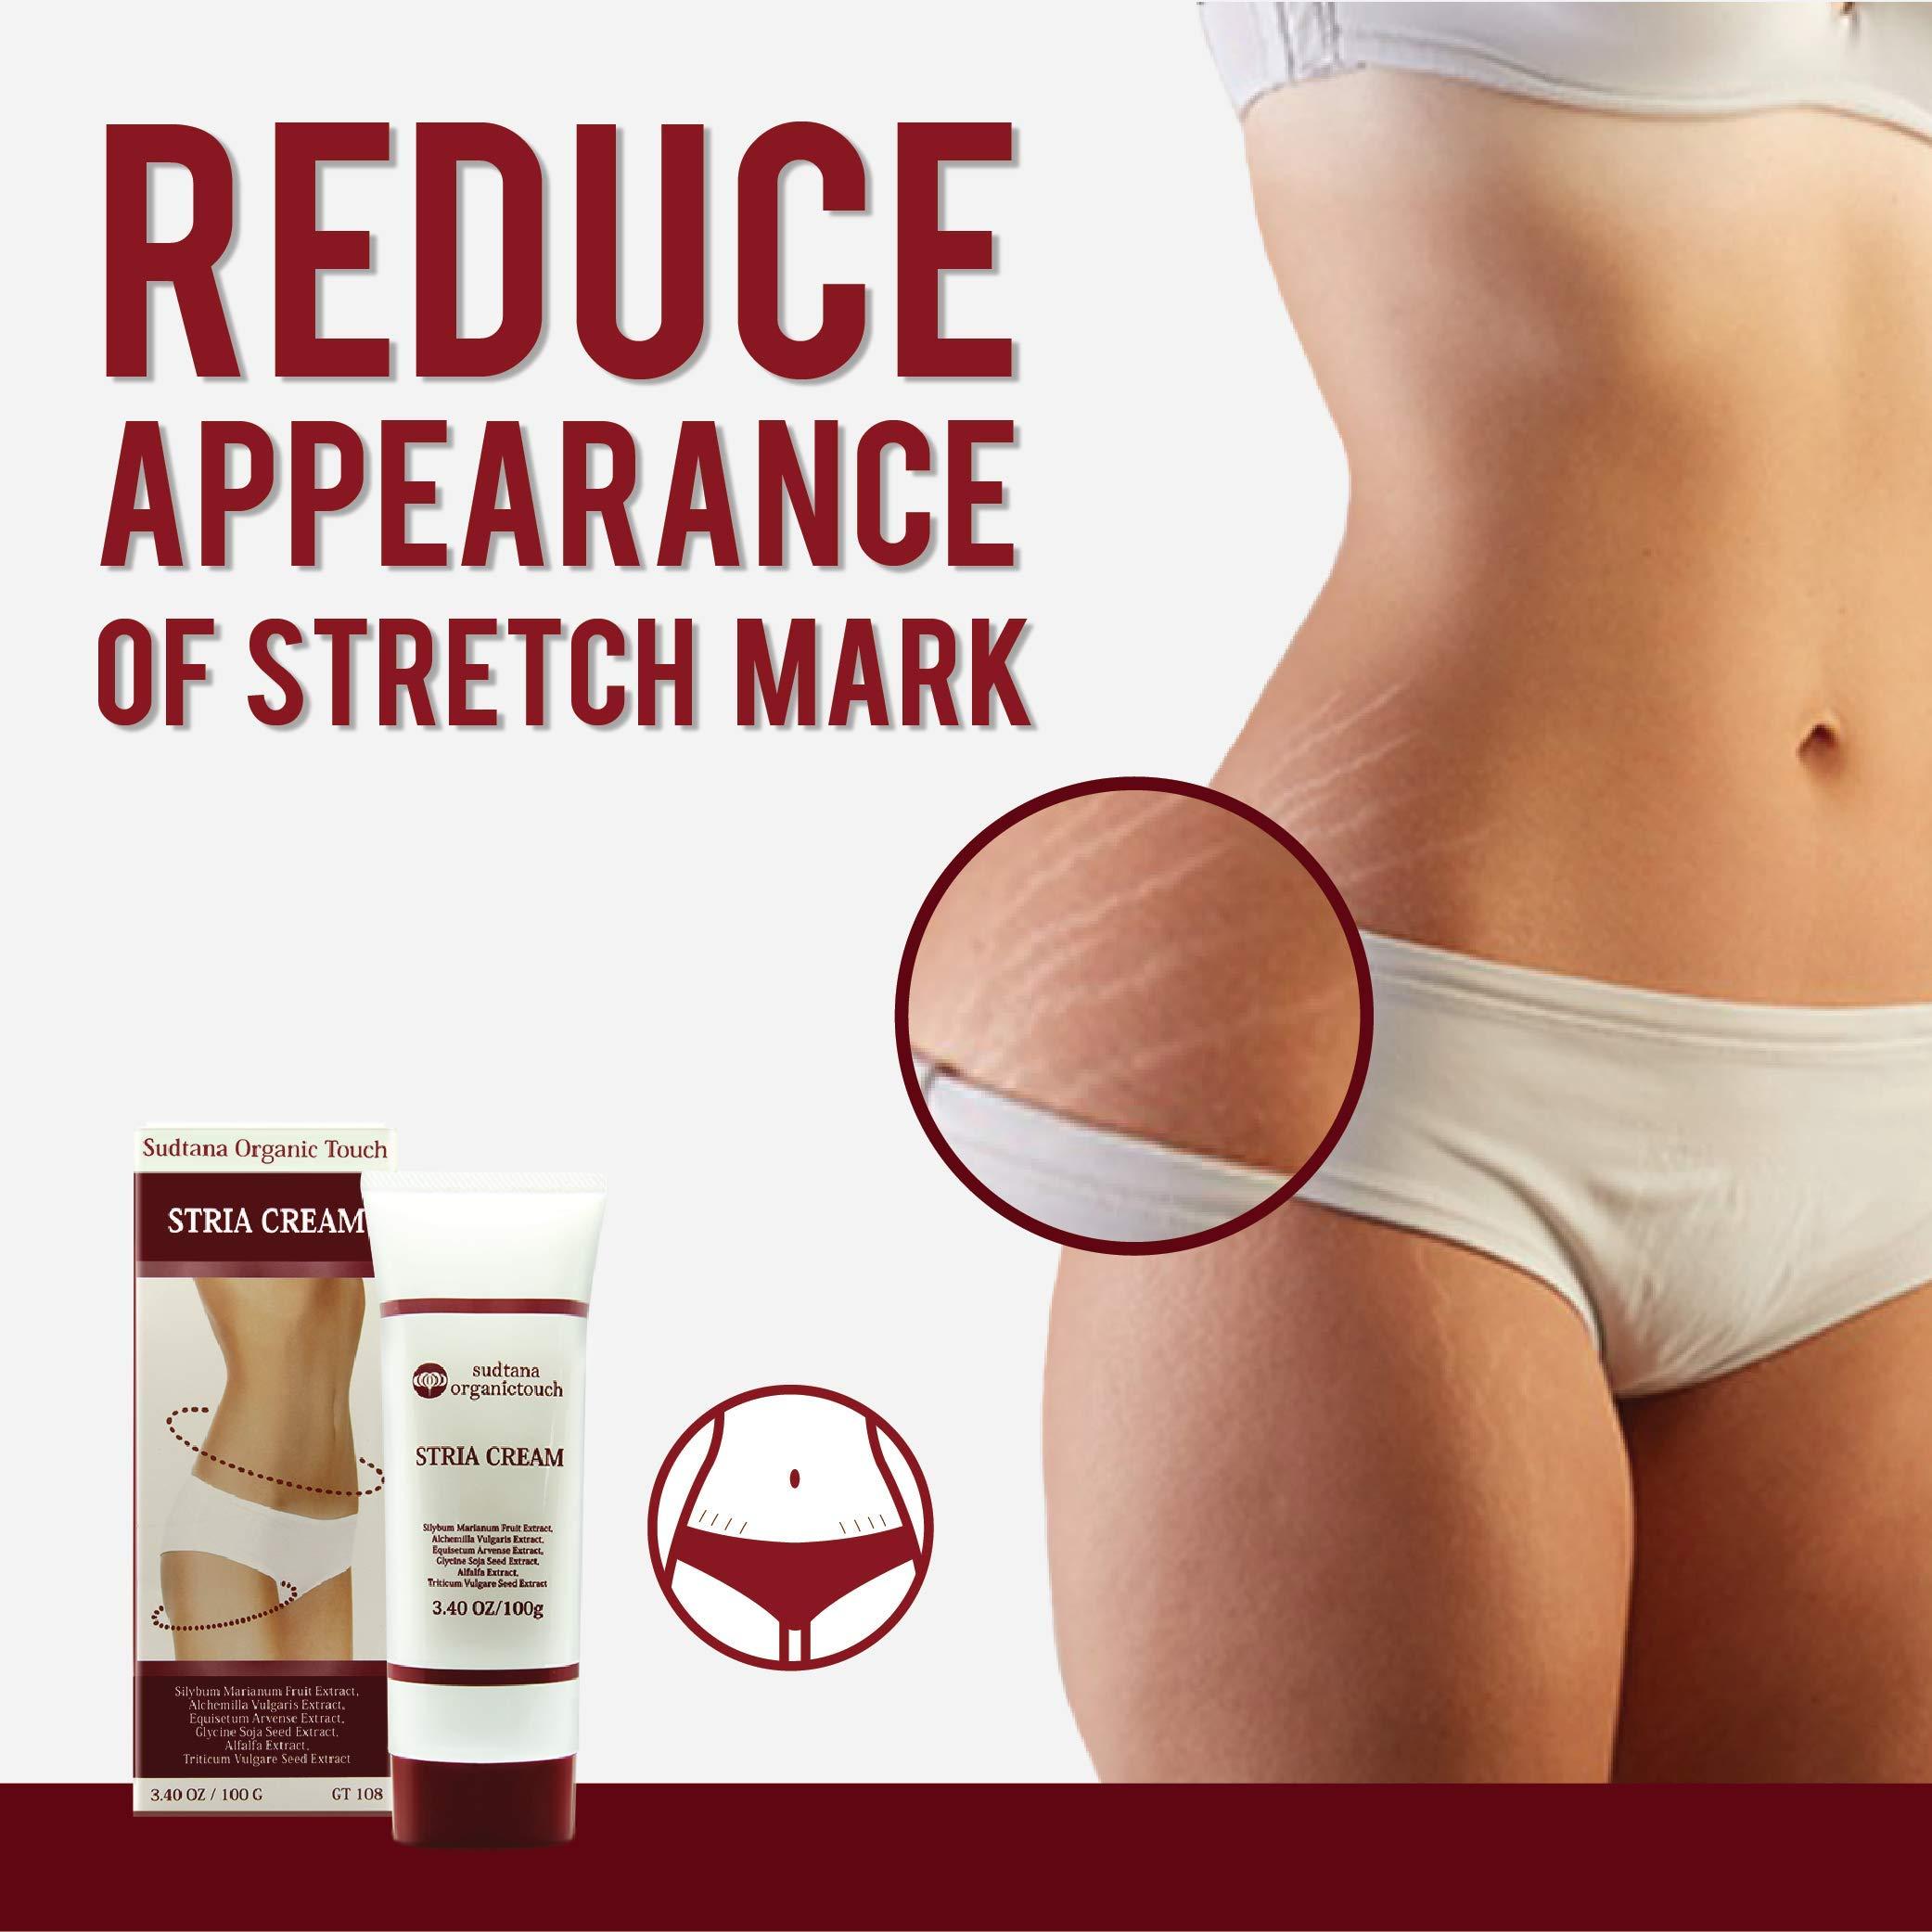 STRIA Natural Stretch Marks, Scar & Dark Spot Remover   Stretch Mark Cream for Skin Hydration, Exfoliation, Tightening & Collagen Boost   Pregnancy Belly Care for Prenatal-Postnatal & Pregnant   3 pcs by GreenTouch (Image #3)